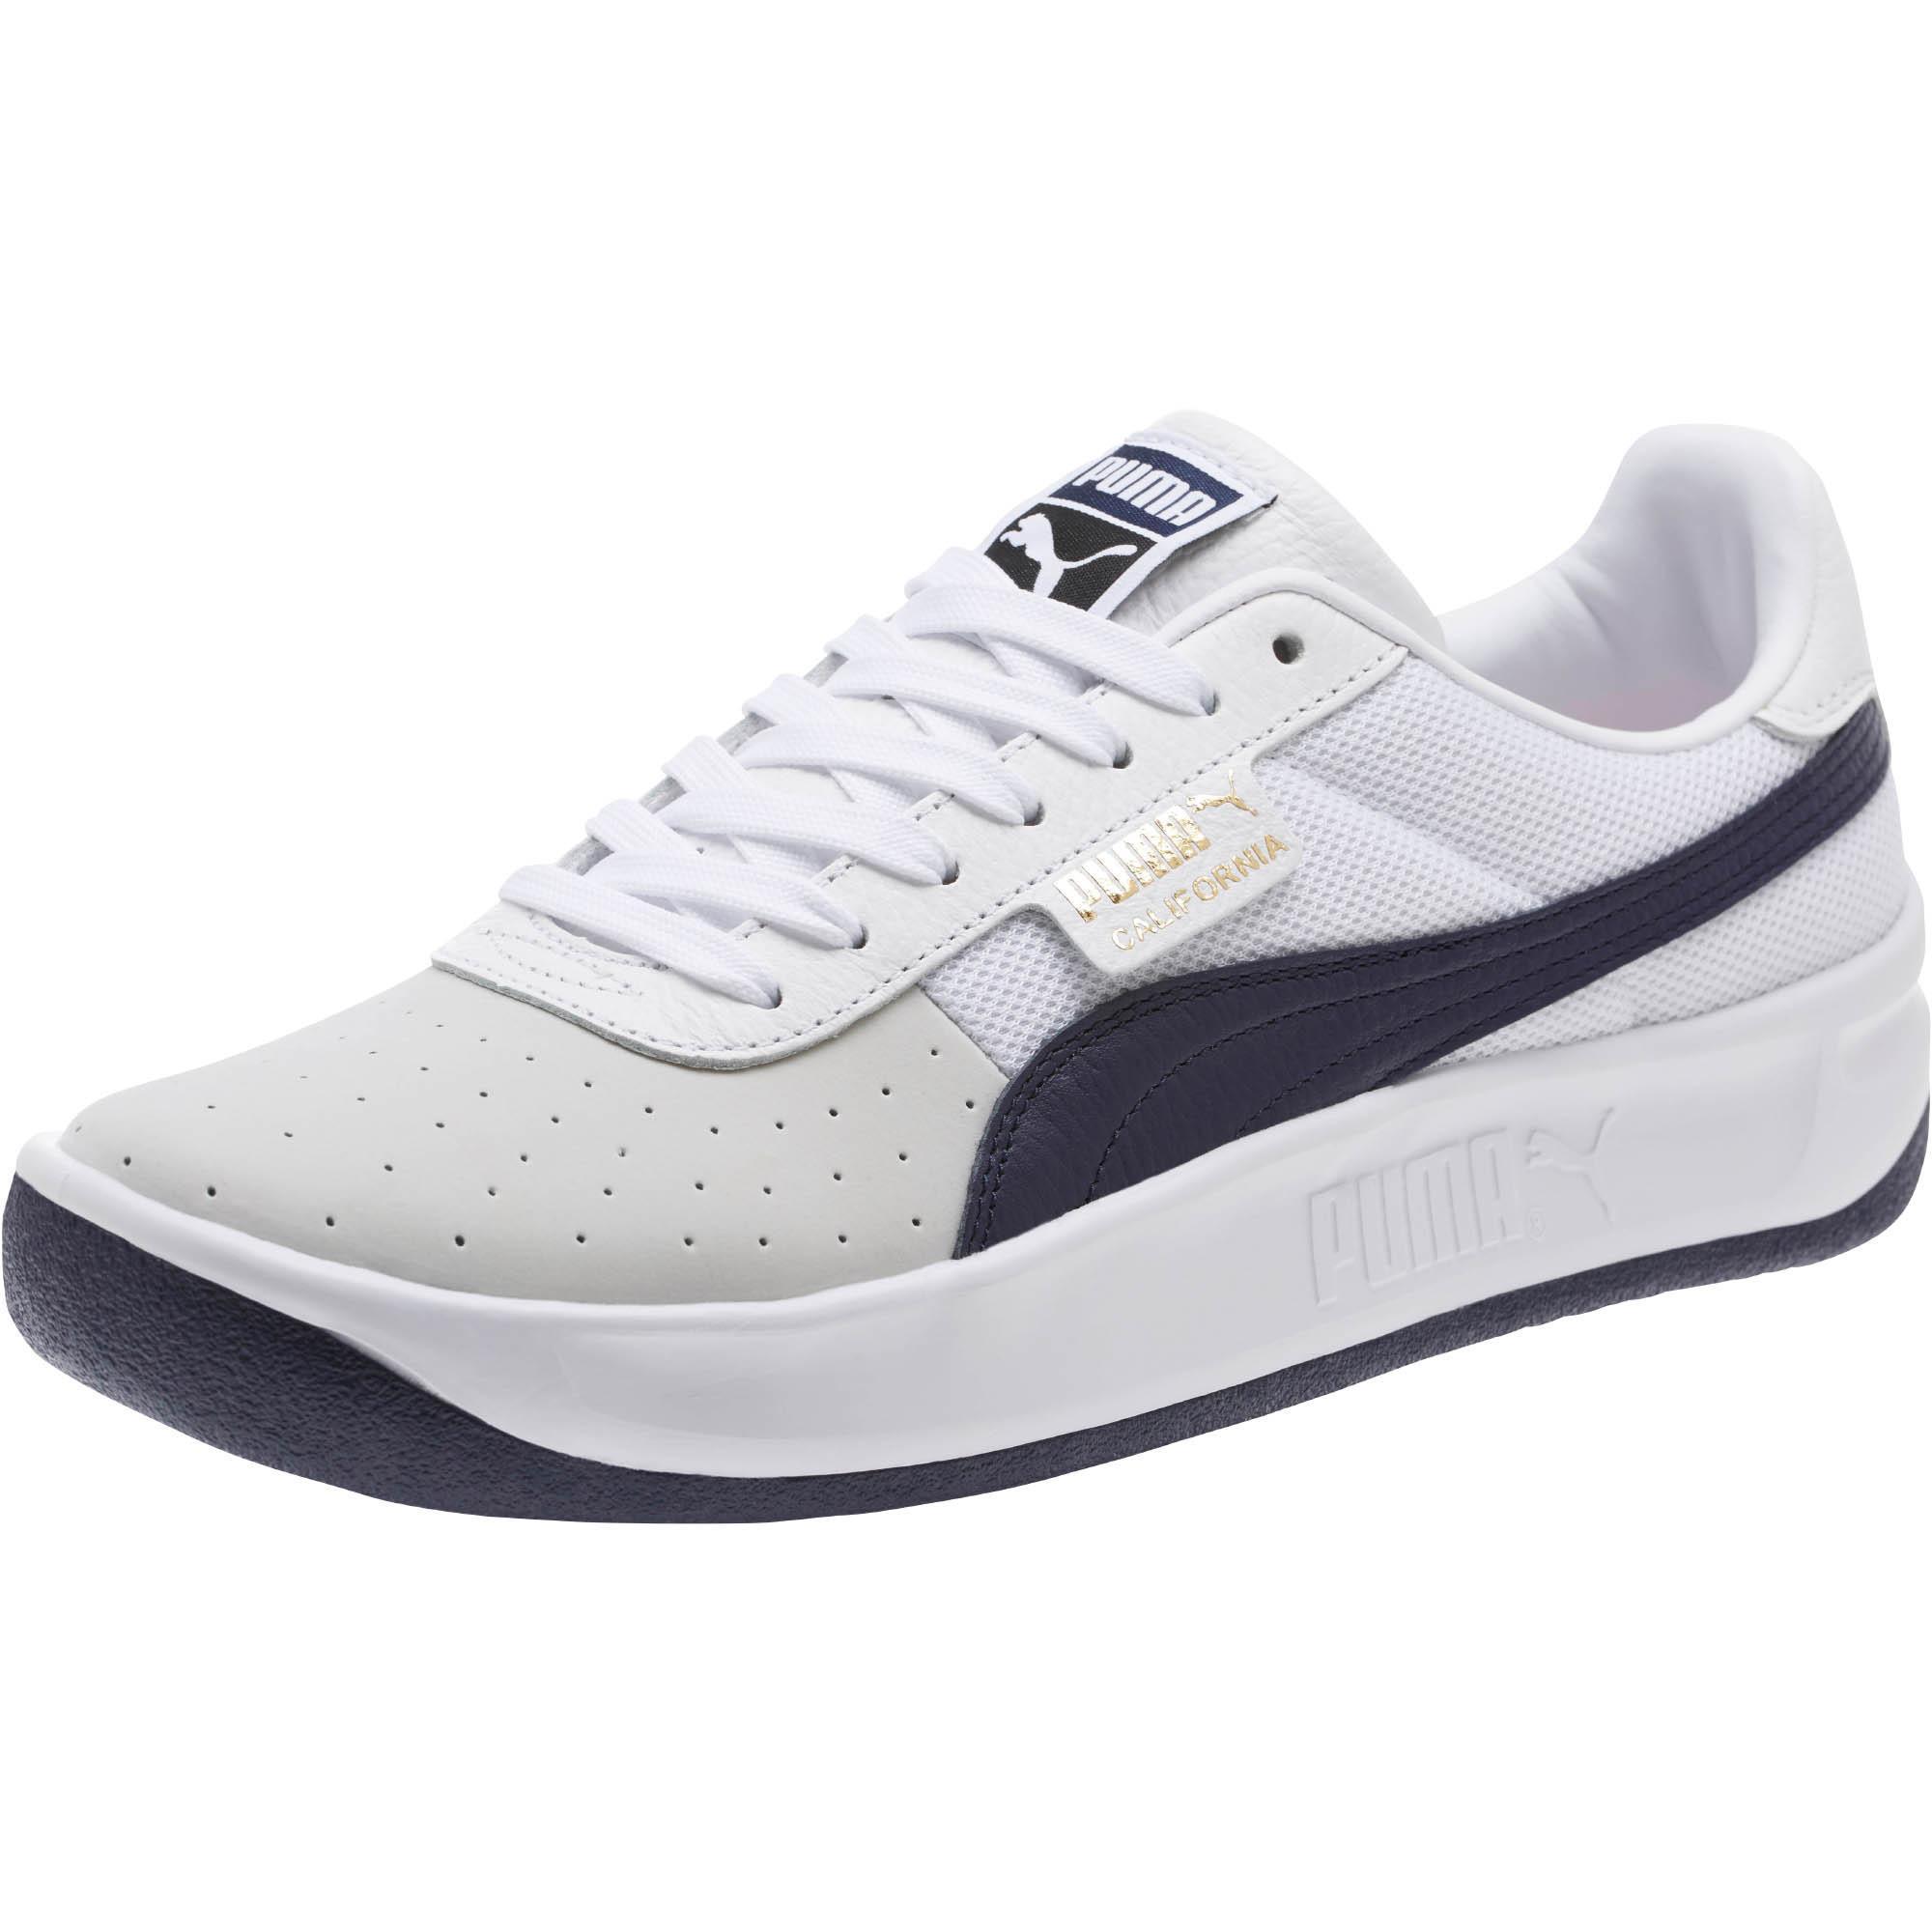 puma california casual sneakers